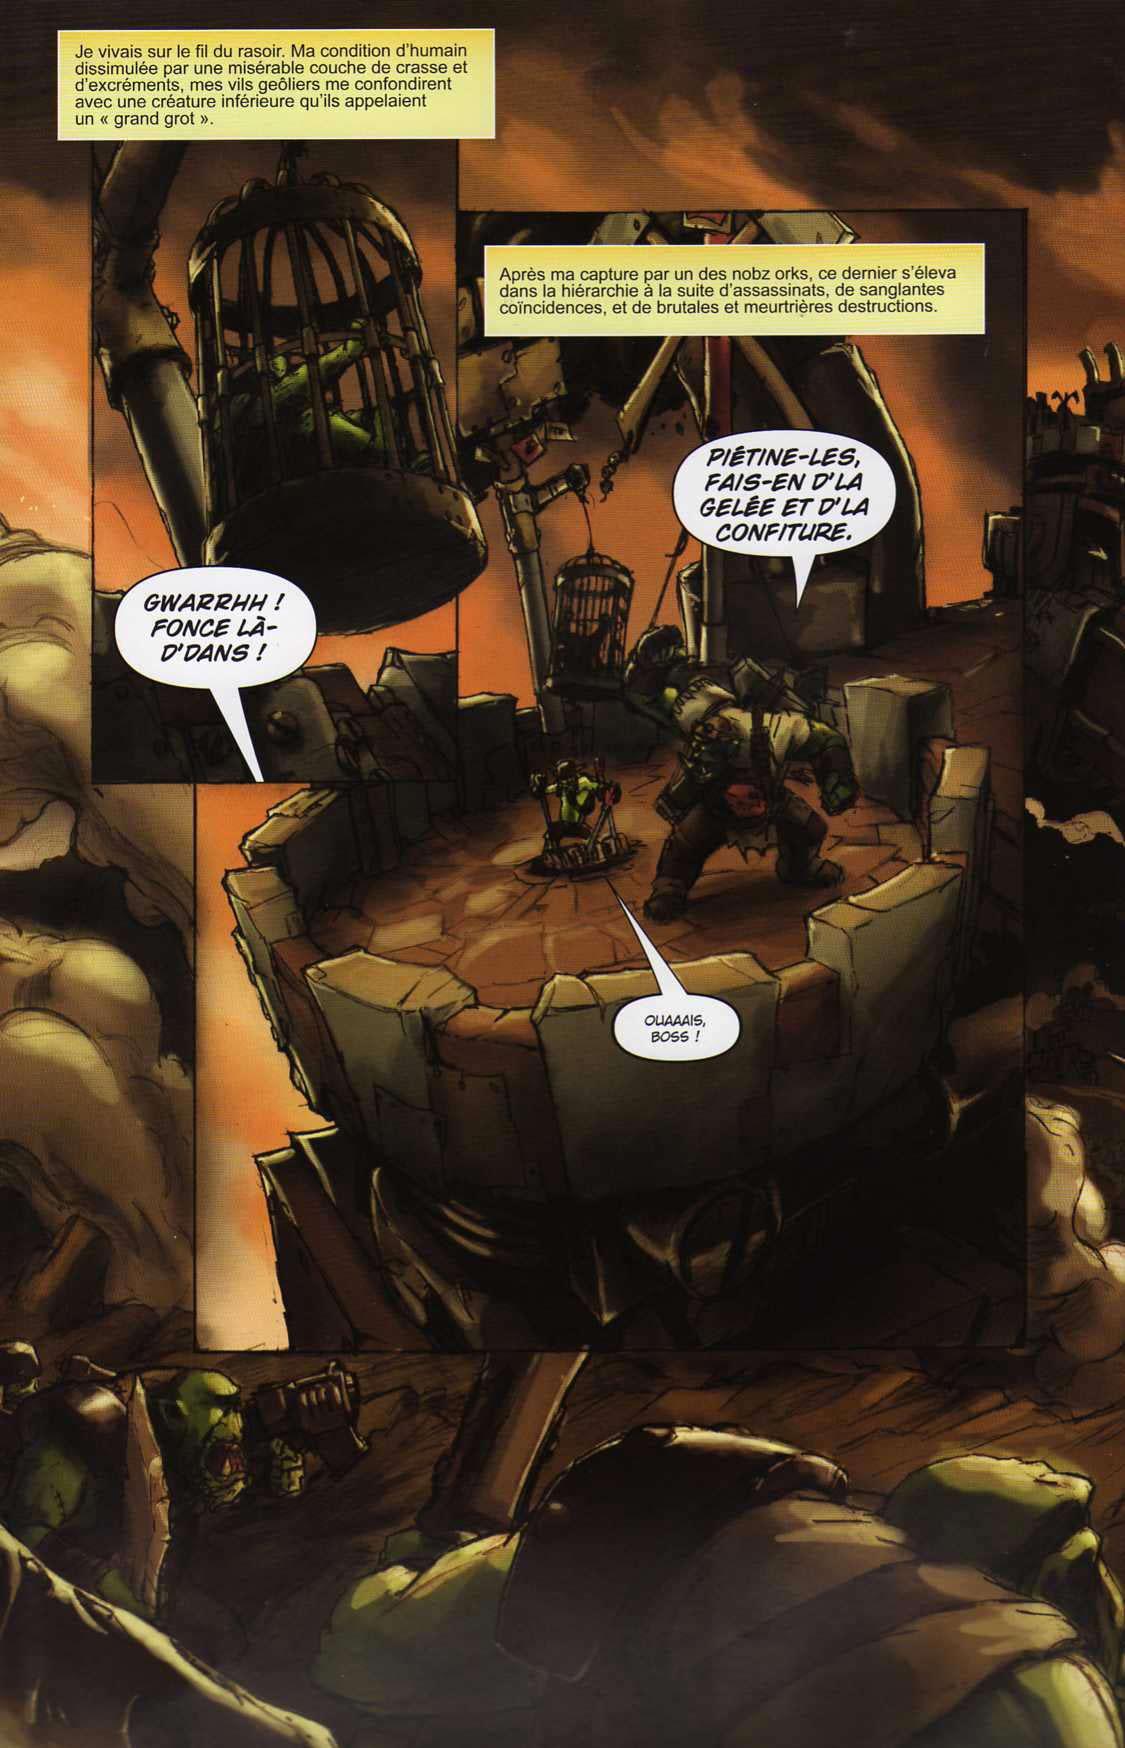 T4 : Le clan des Orks - Warhammer 40.000 (page 2)